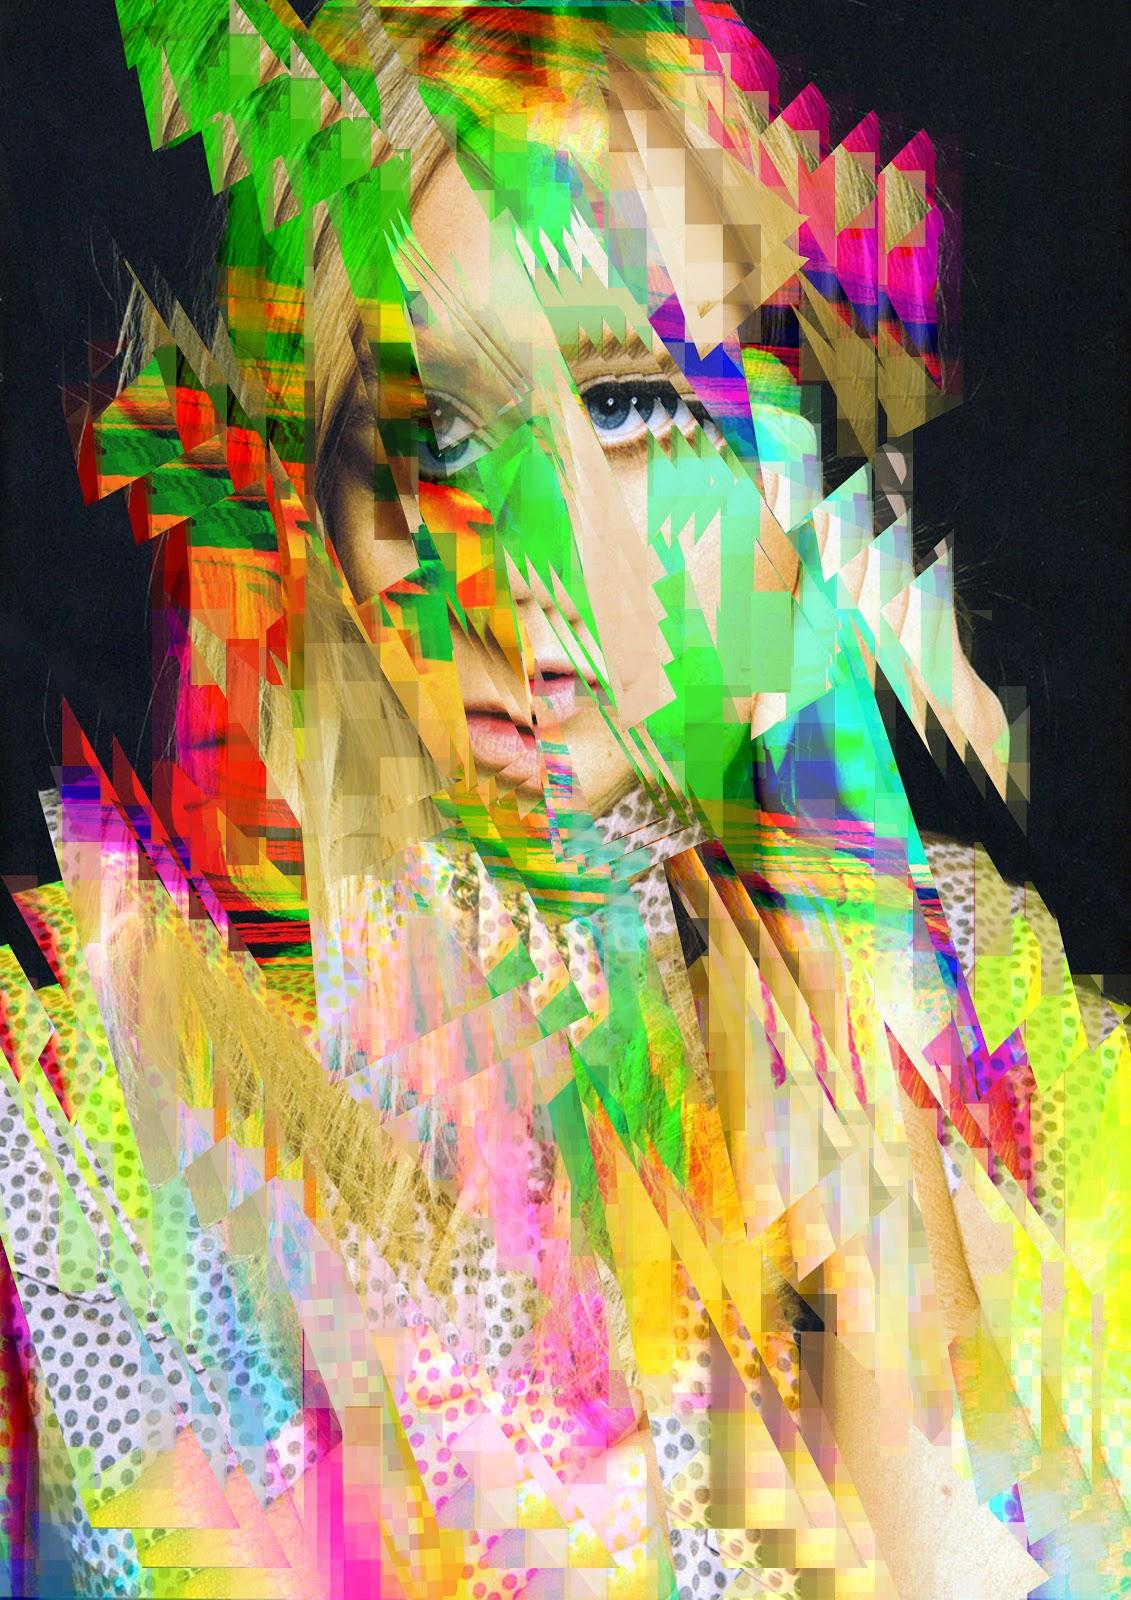 http://2.bp.blogspot.com/-gTxfNt9o4vU/TfEzMwa5ZDI/AAAAAAAAAIU/UFCE-PaEwTI/s1600/CHLOE+SEVIGNY.jpg